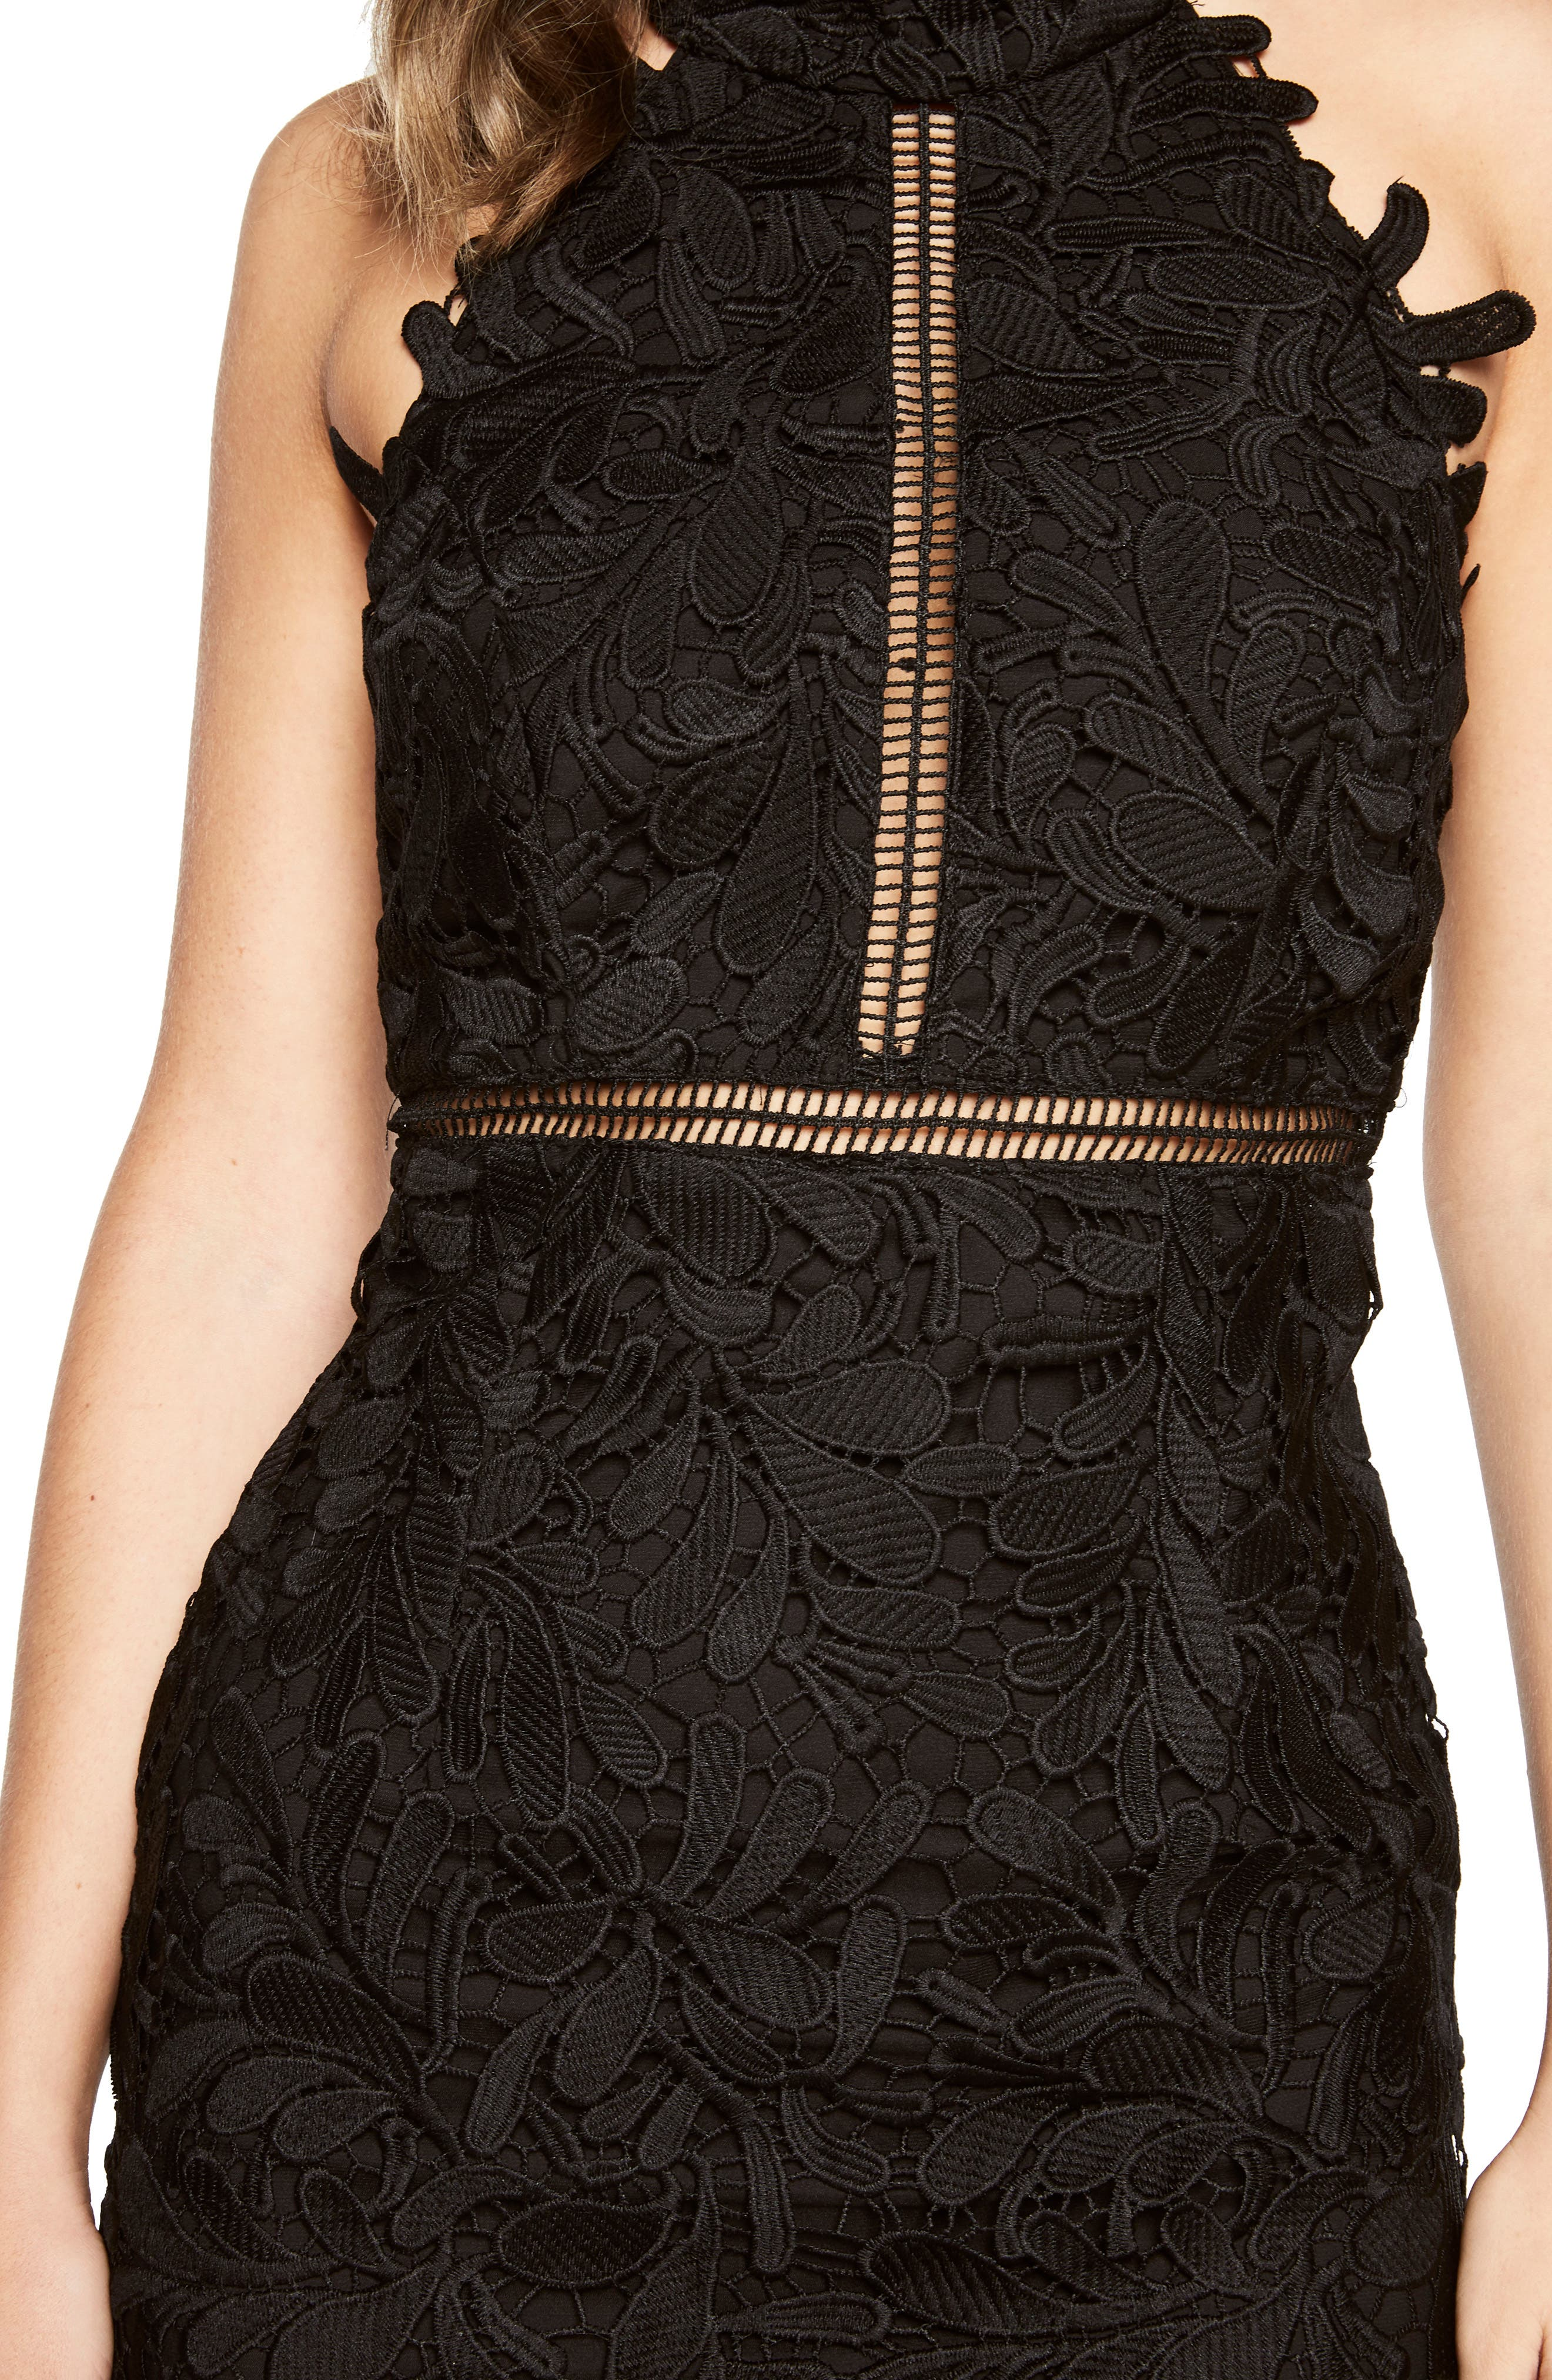 Kara Lace Halter Dress,                             Alternate thumbnail 4, color,                             001